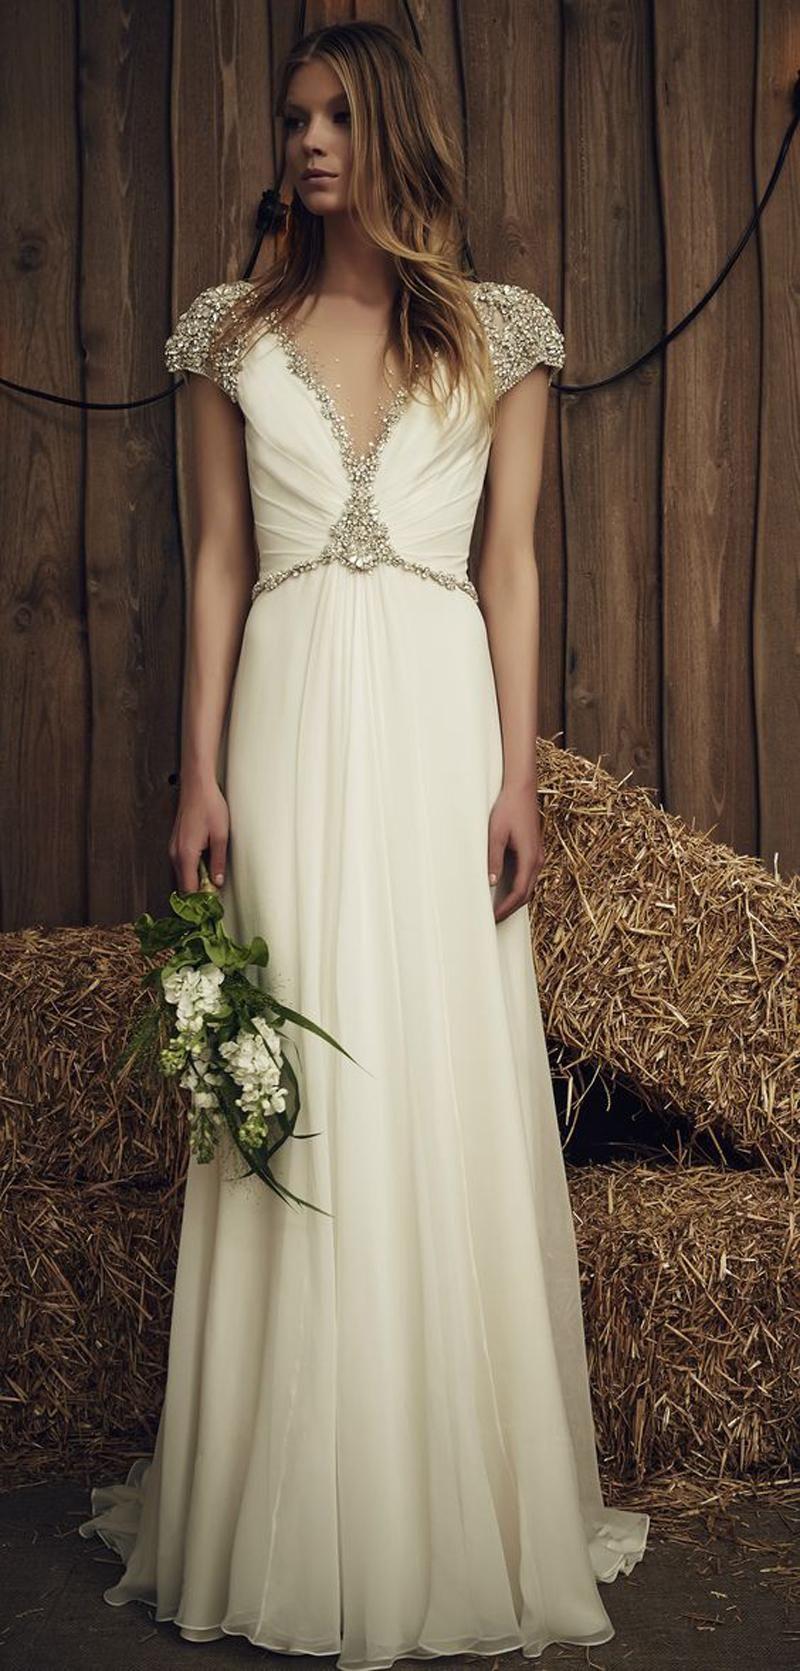 Crystals Beaded Beach Chiffon Wedding Dresses 2017 Jenny Packham ...